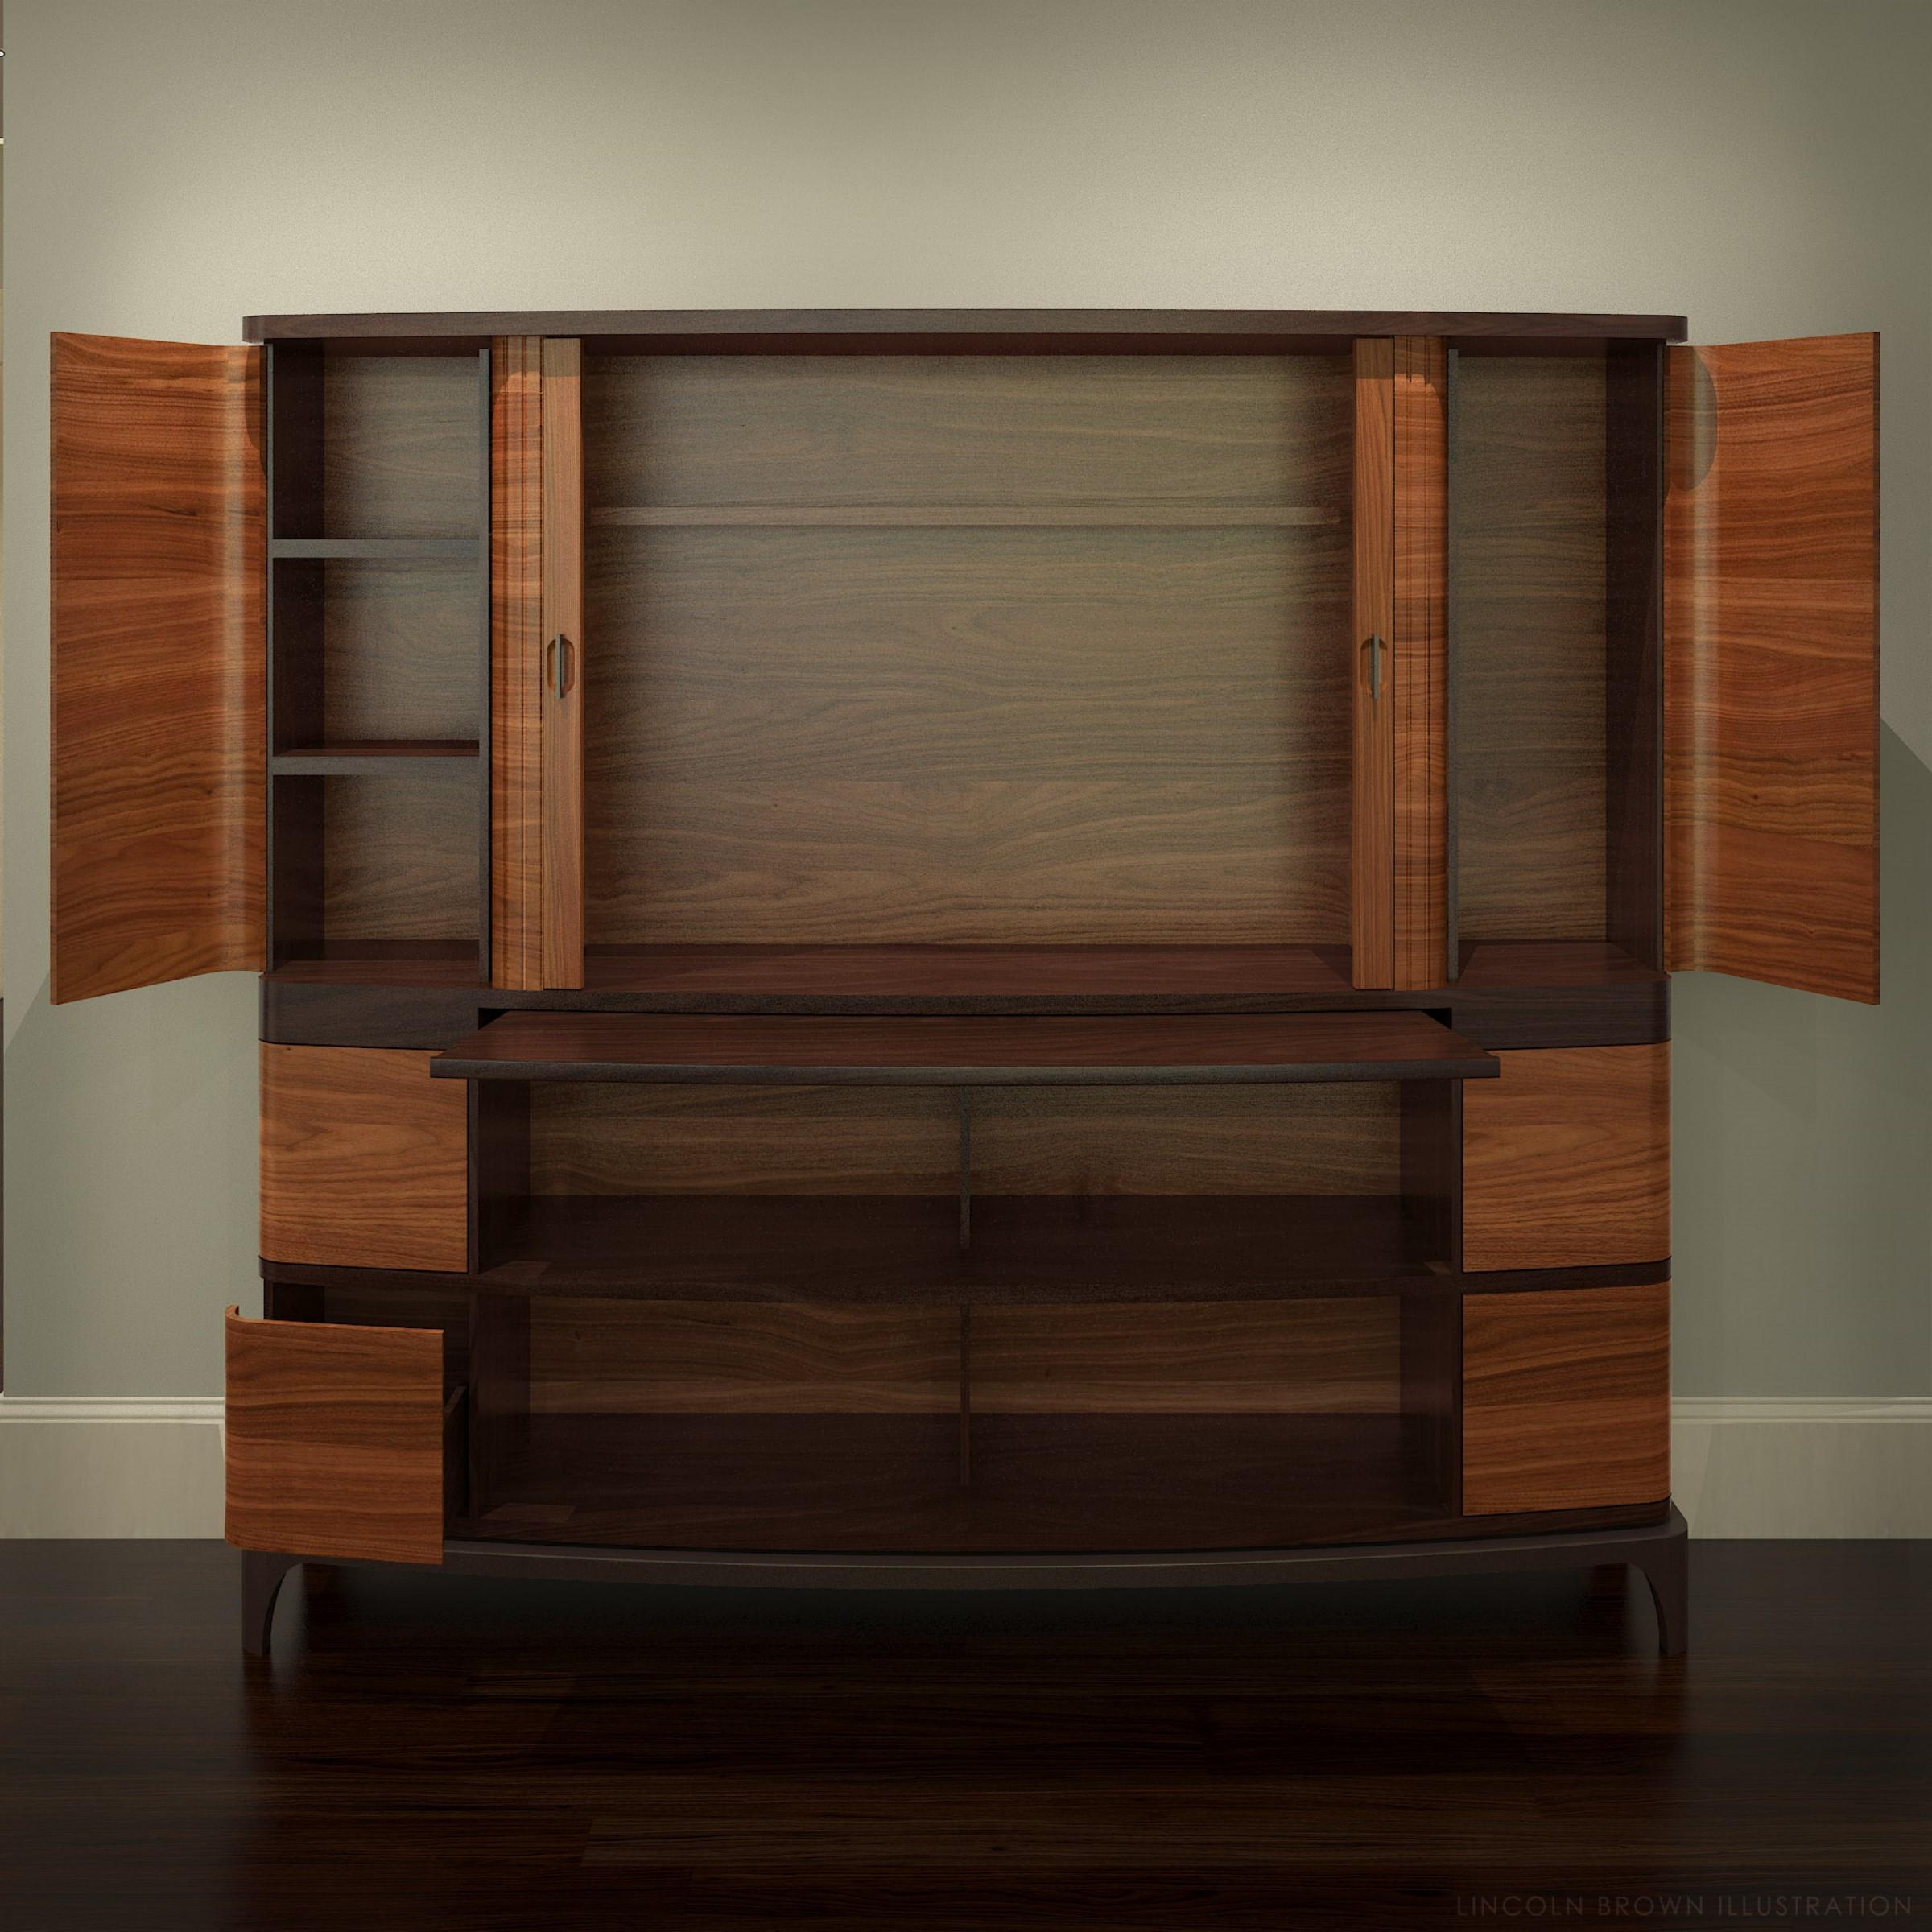 2016-08 Abramson Weston - Cabinet01 open c03.jpg